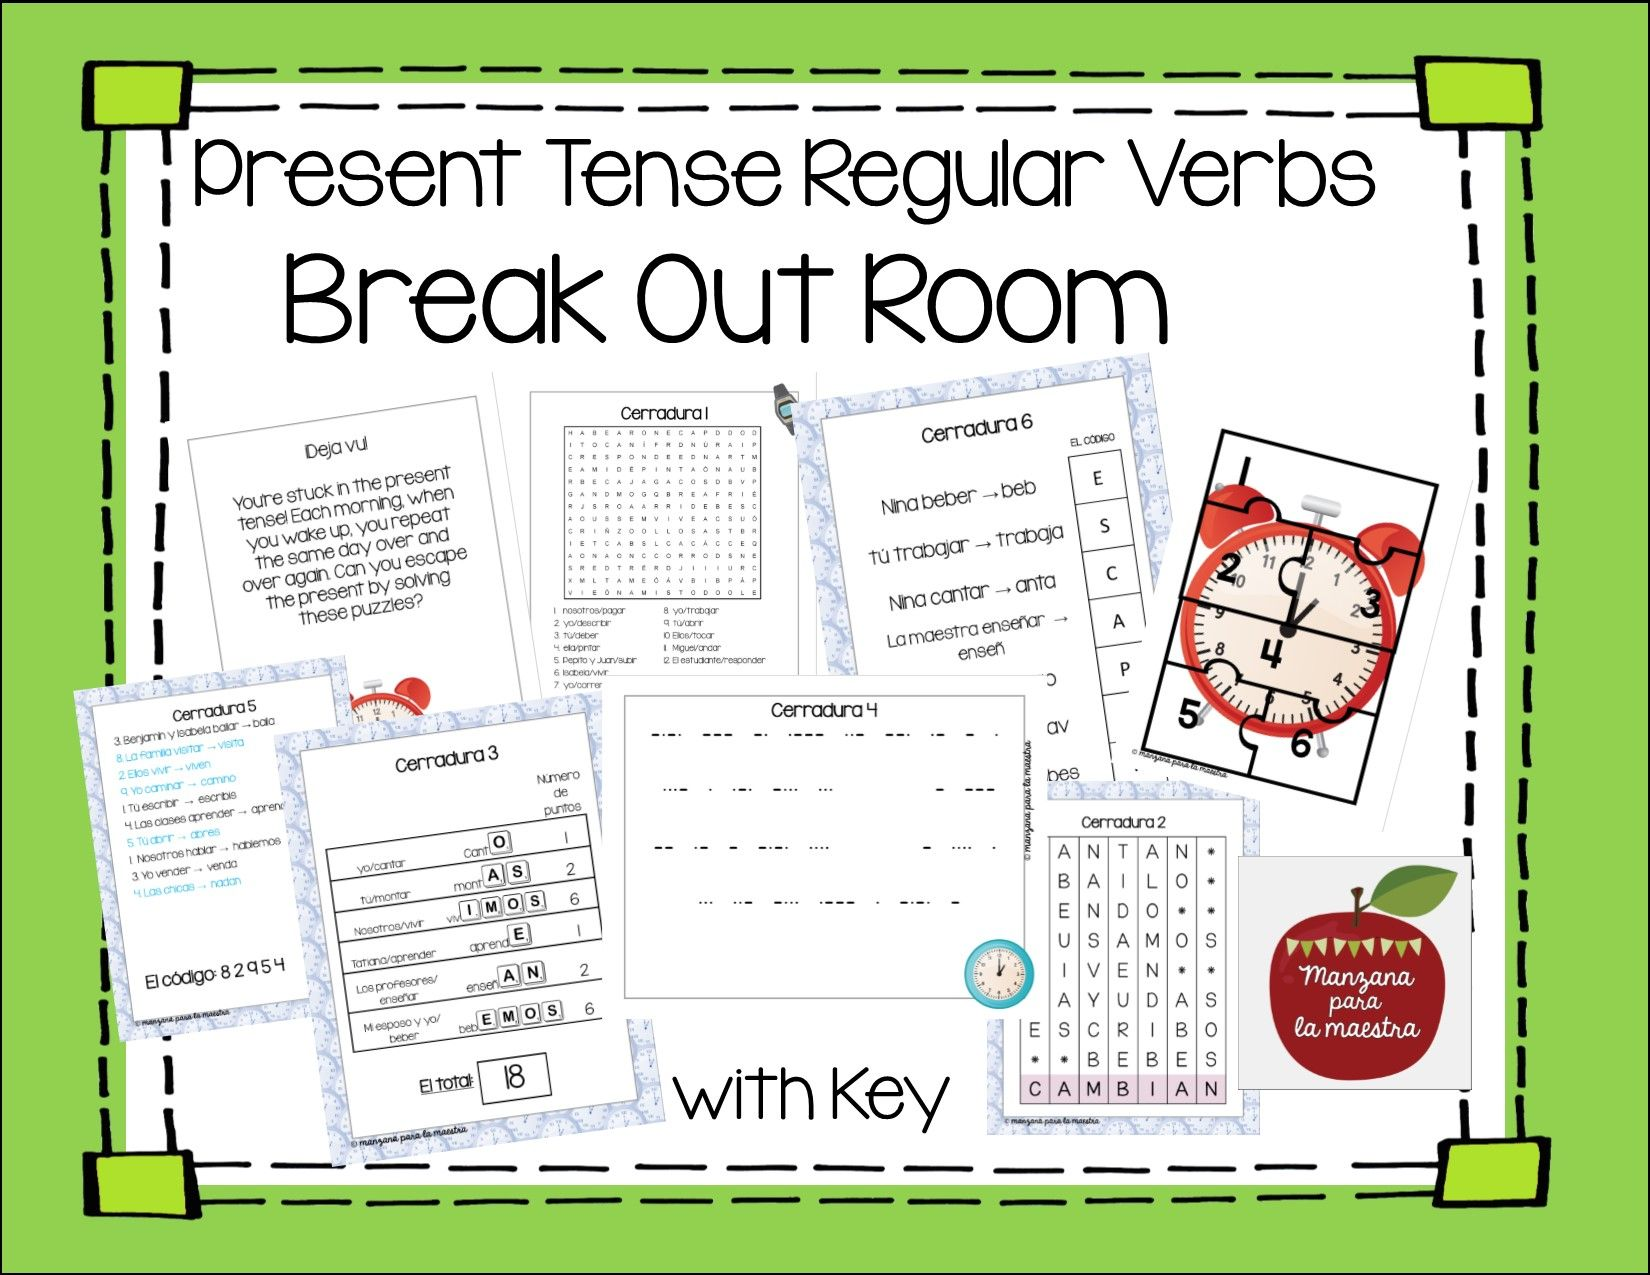 Pin By Traci Martinez On Spanish Ideas Verbs Activities Regular Verbs Present Tense Verbs [ 1275 x 1650 Pixel ]